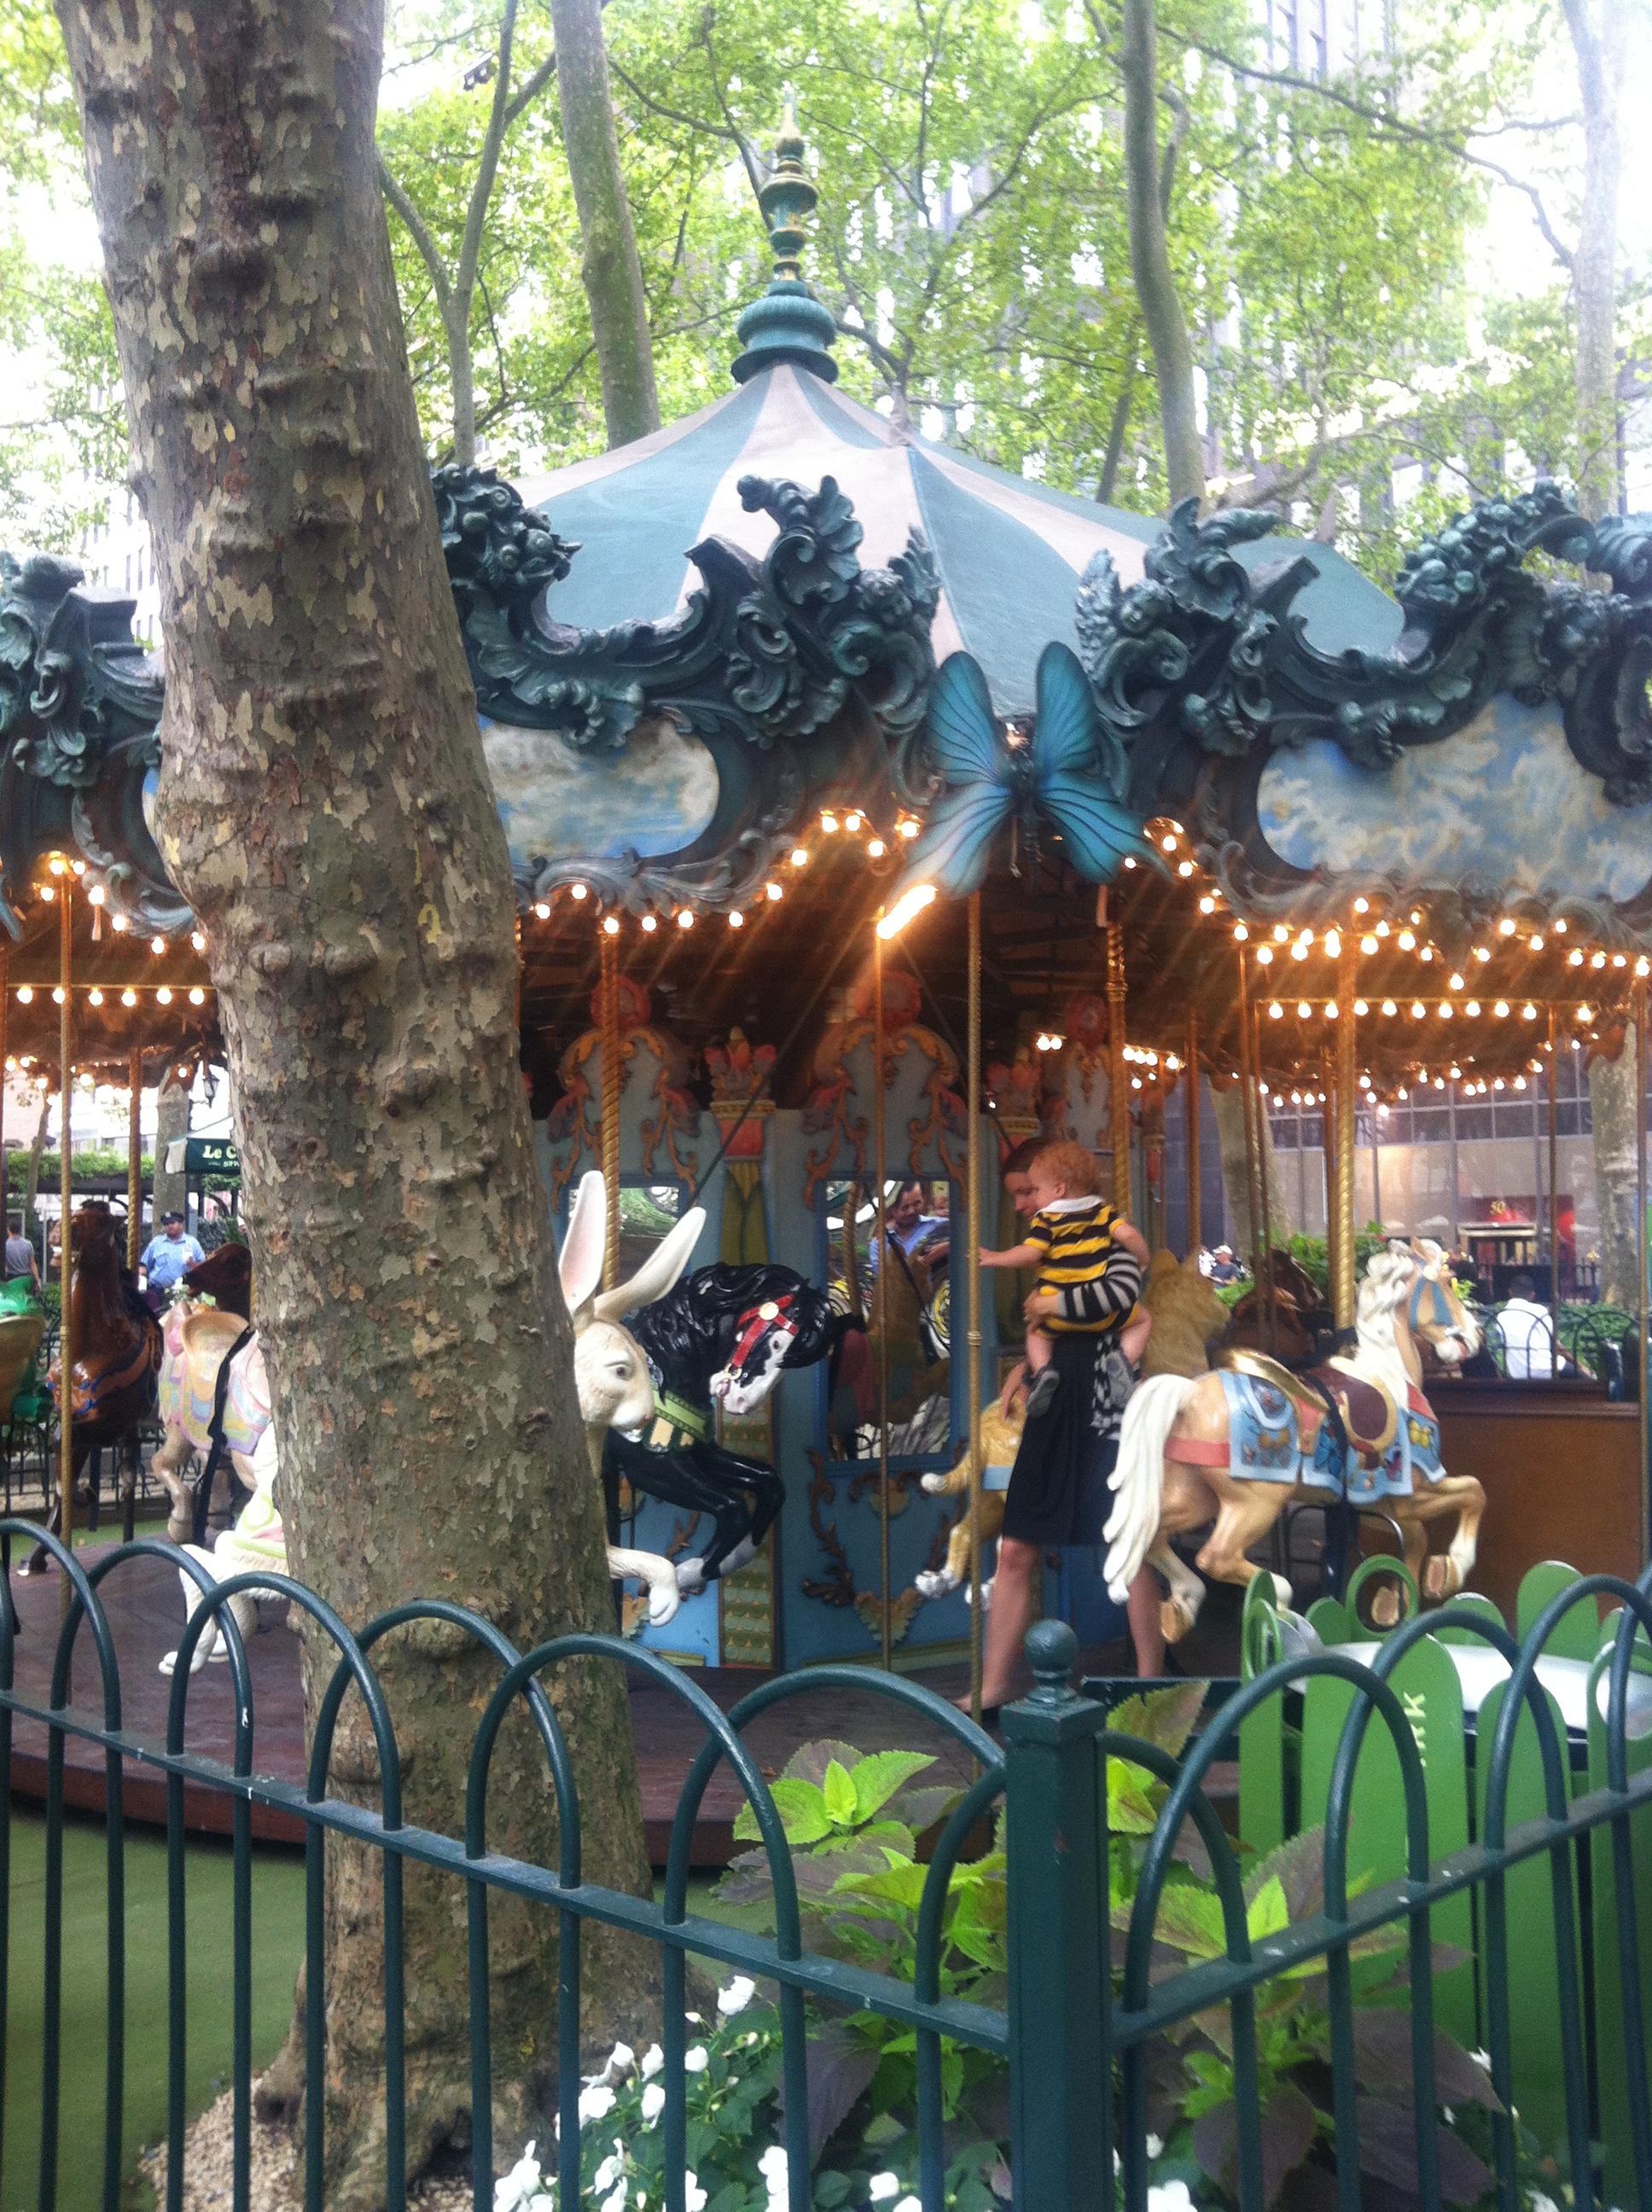 纽约一景——bryant park_图1-6